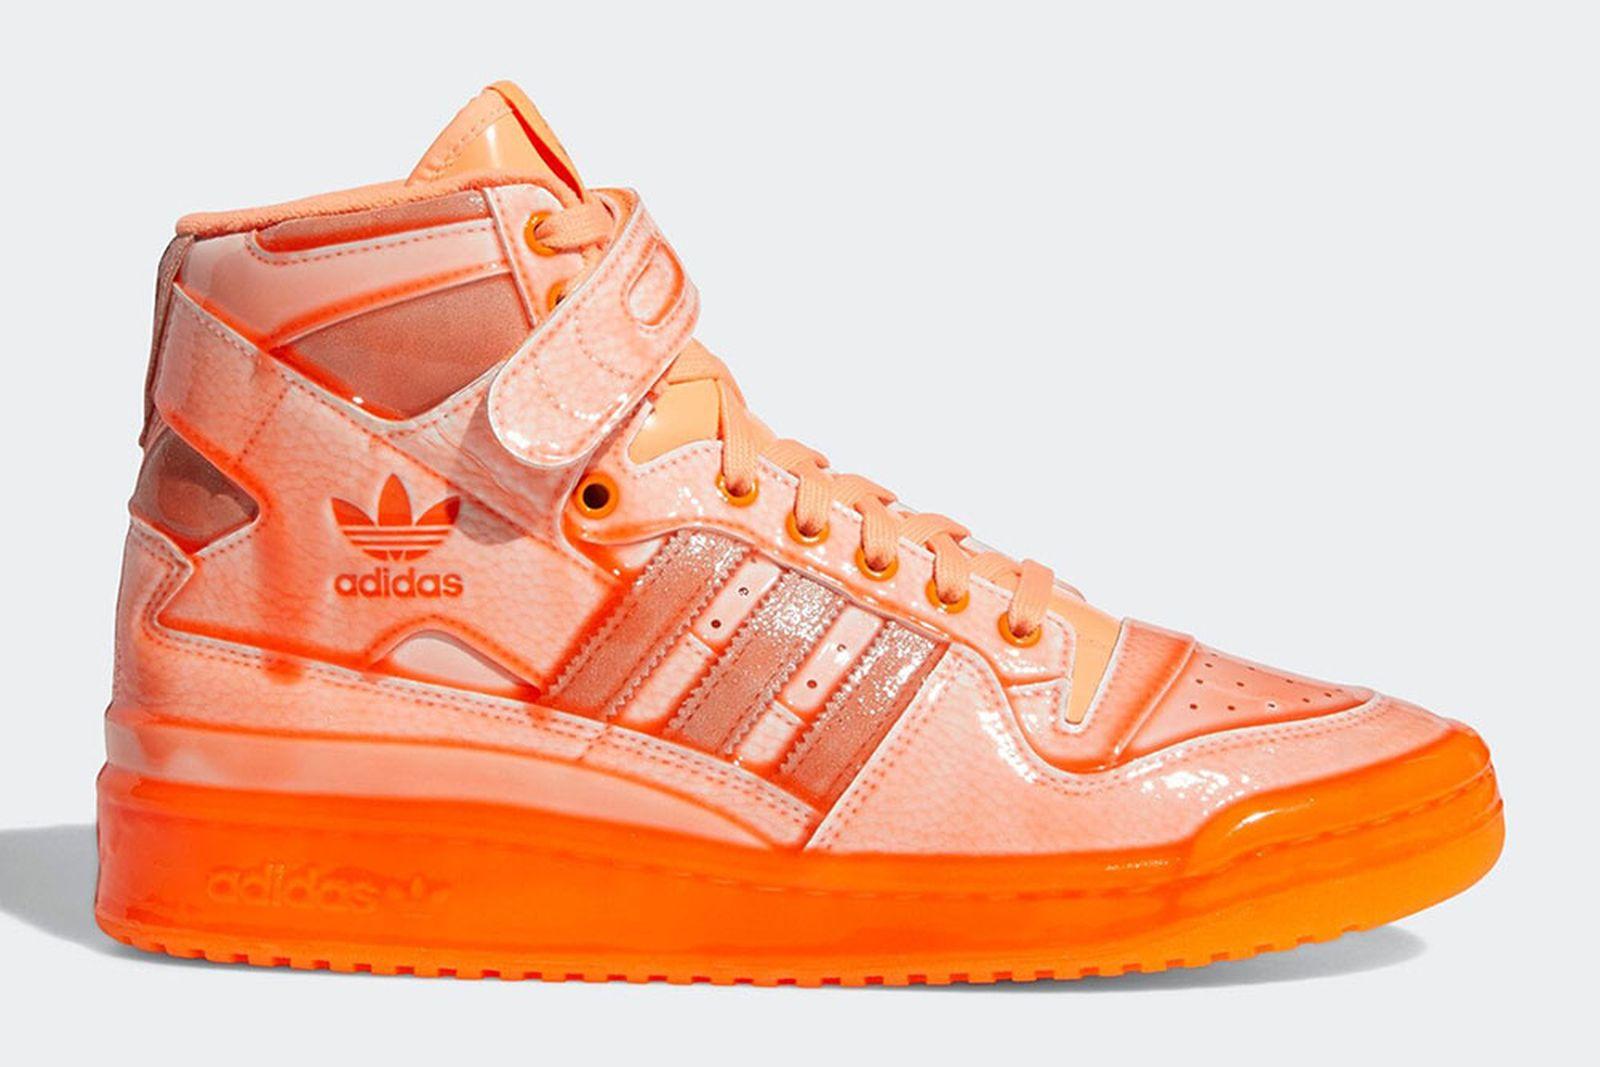 jeremy-scott-adidas-forum-hi-release-date-price-01